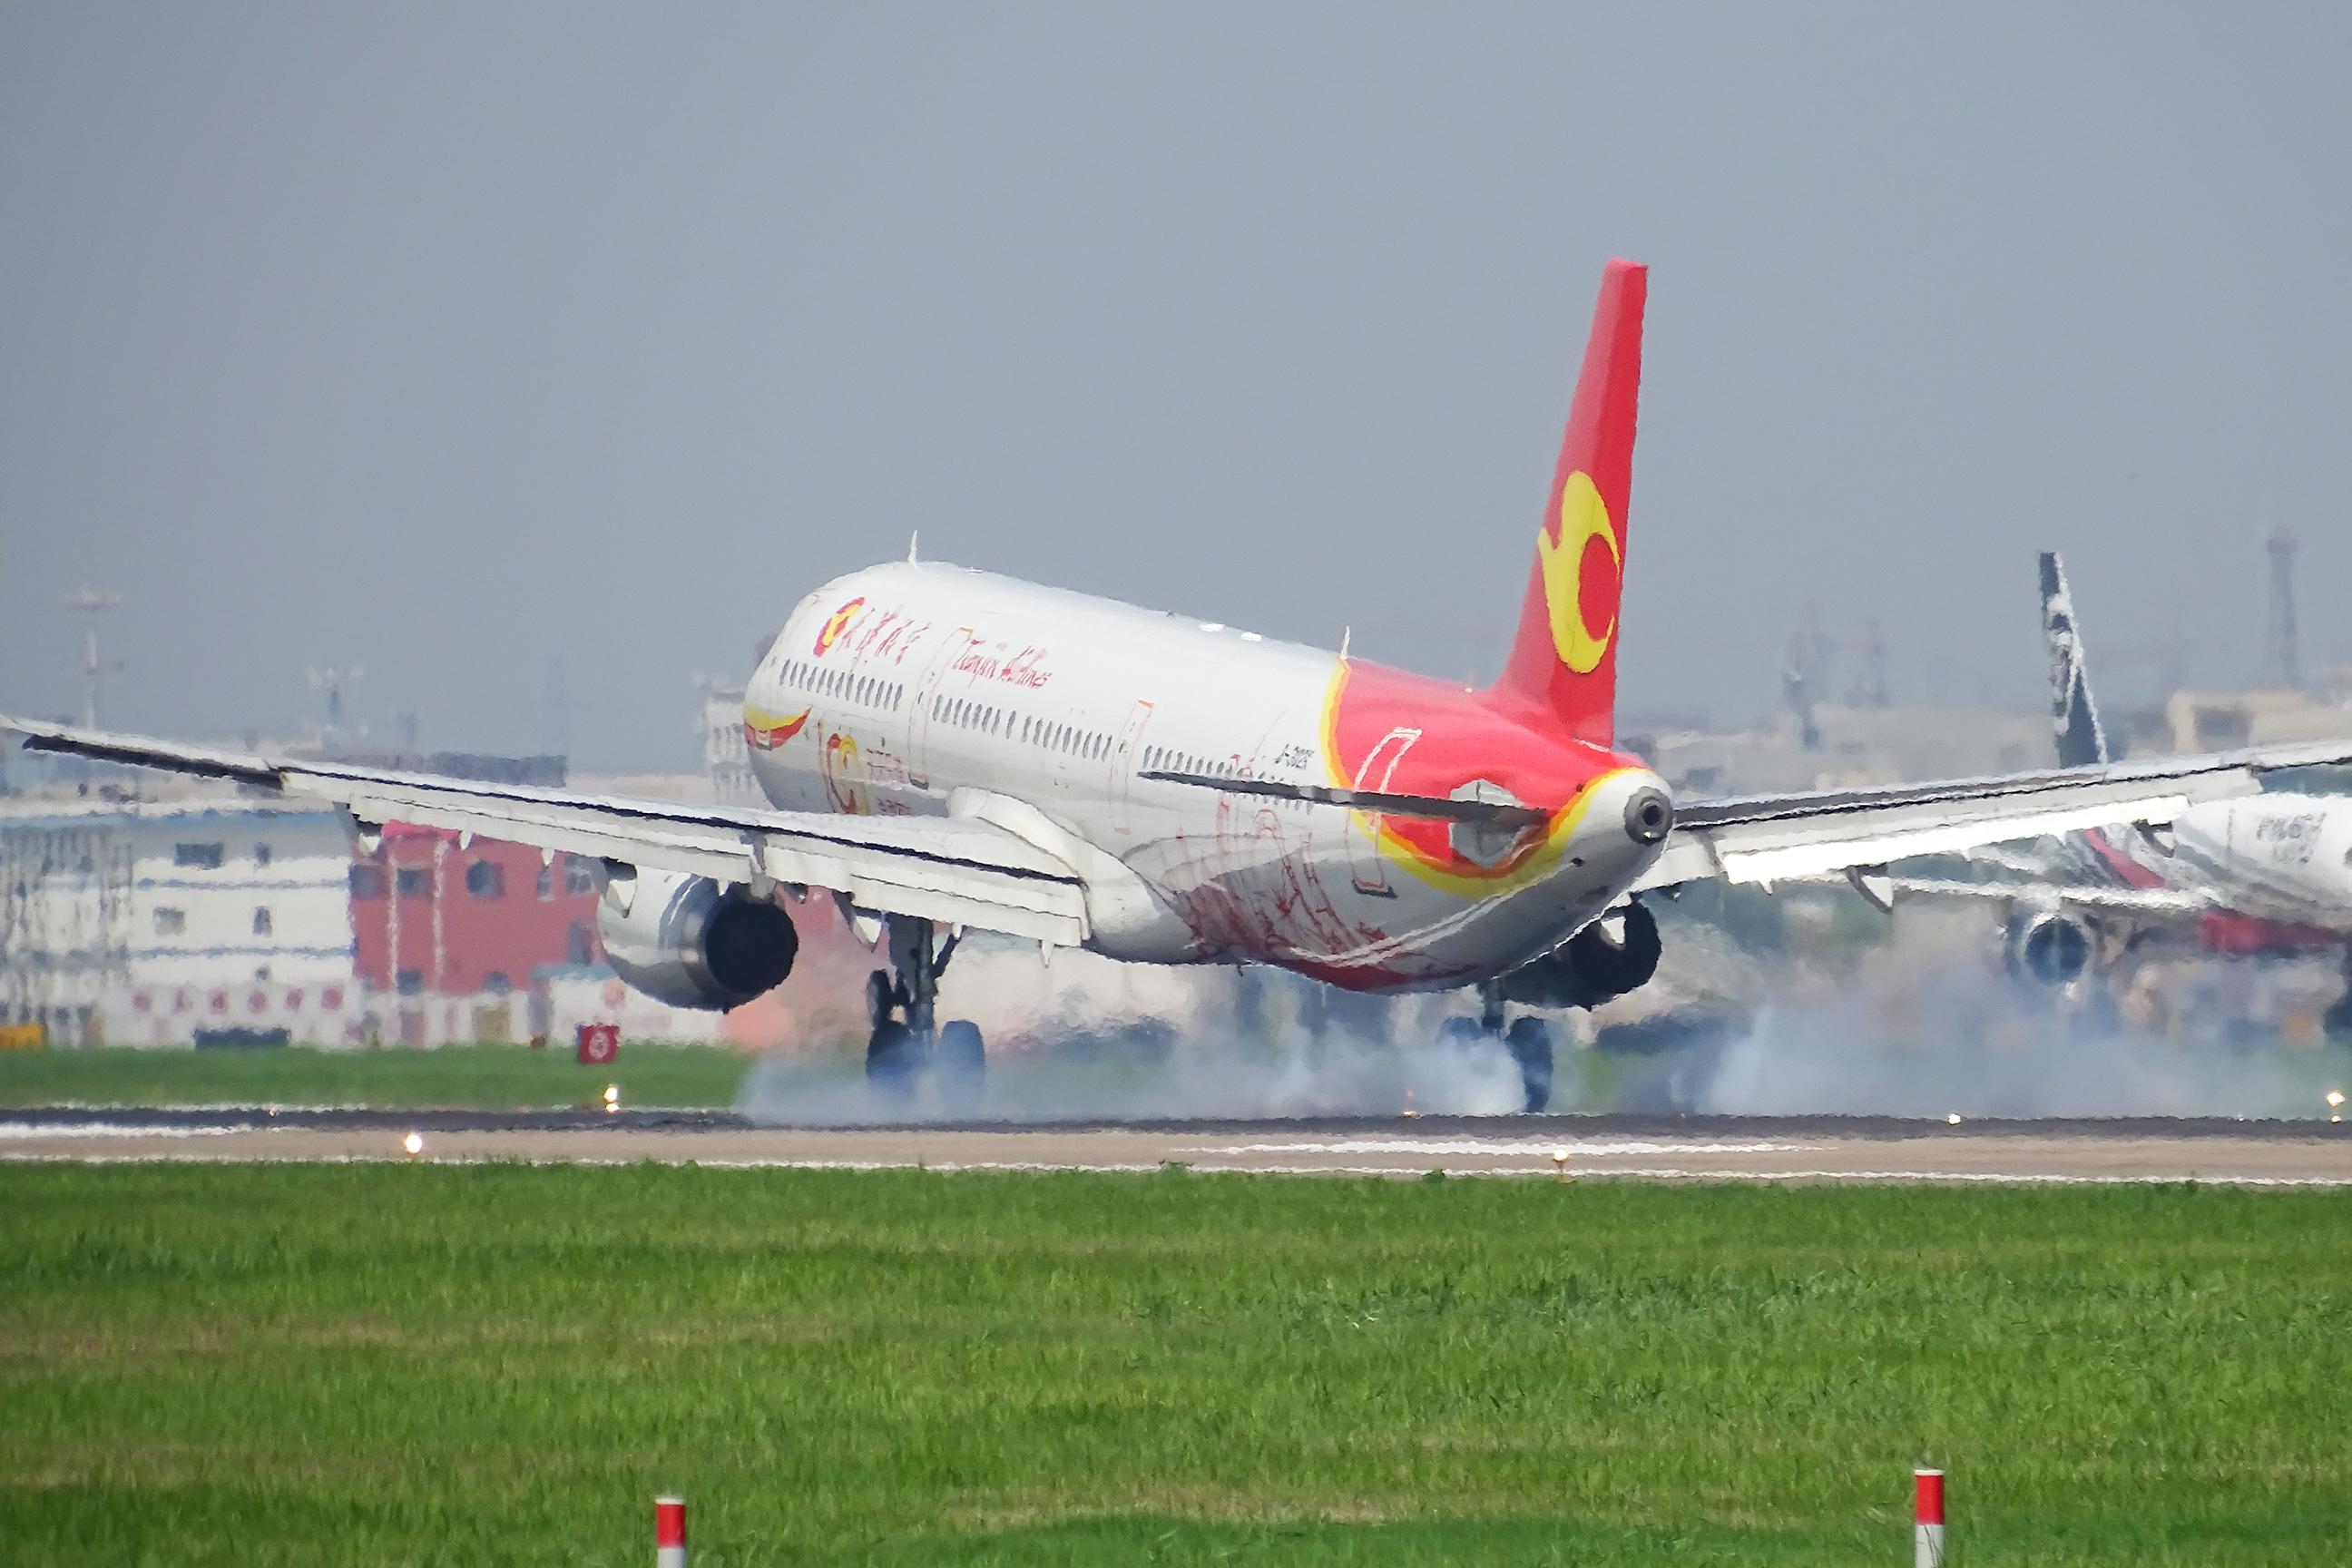 Re:[原创]萧山机场拍机 AIRBUS A321-200 B-302X 中国杭州萧山国际机场